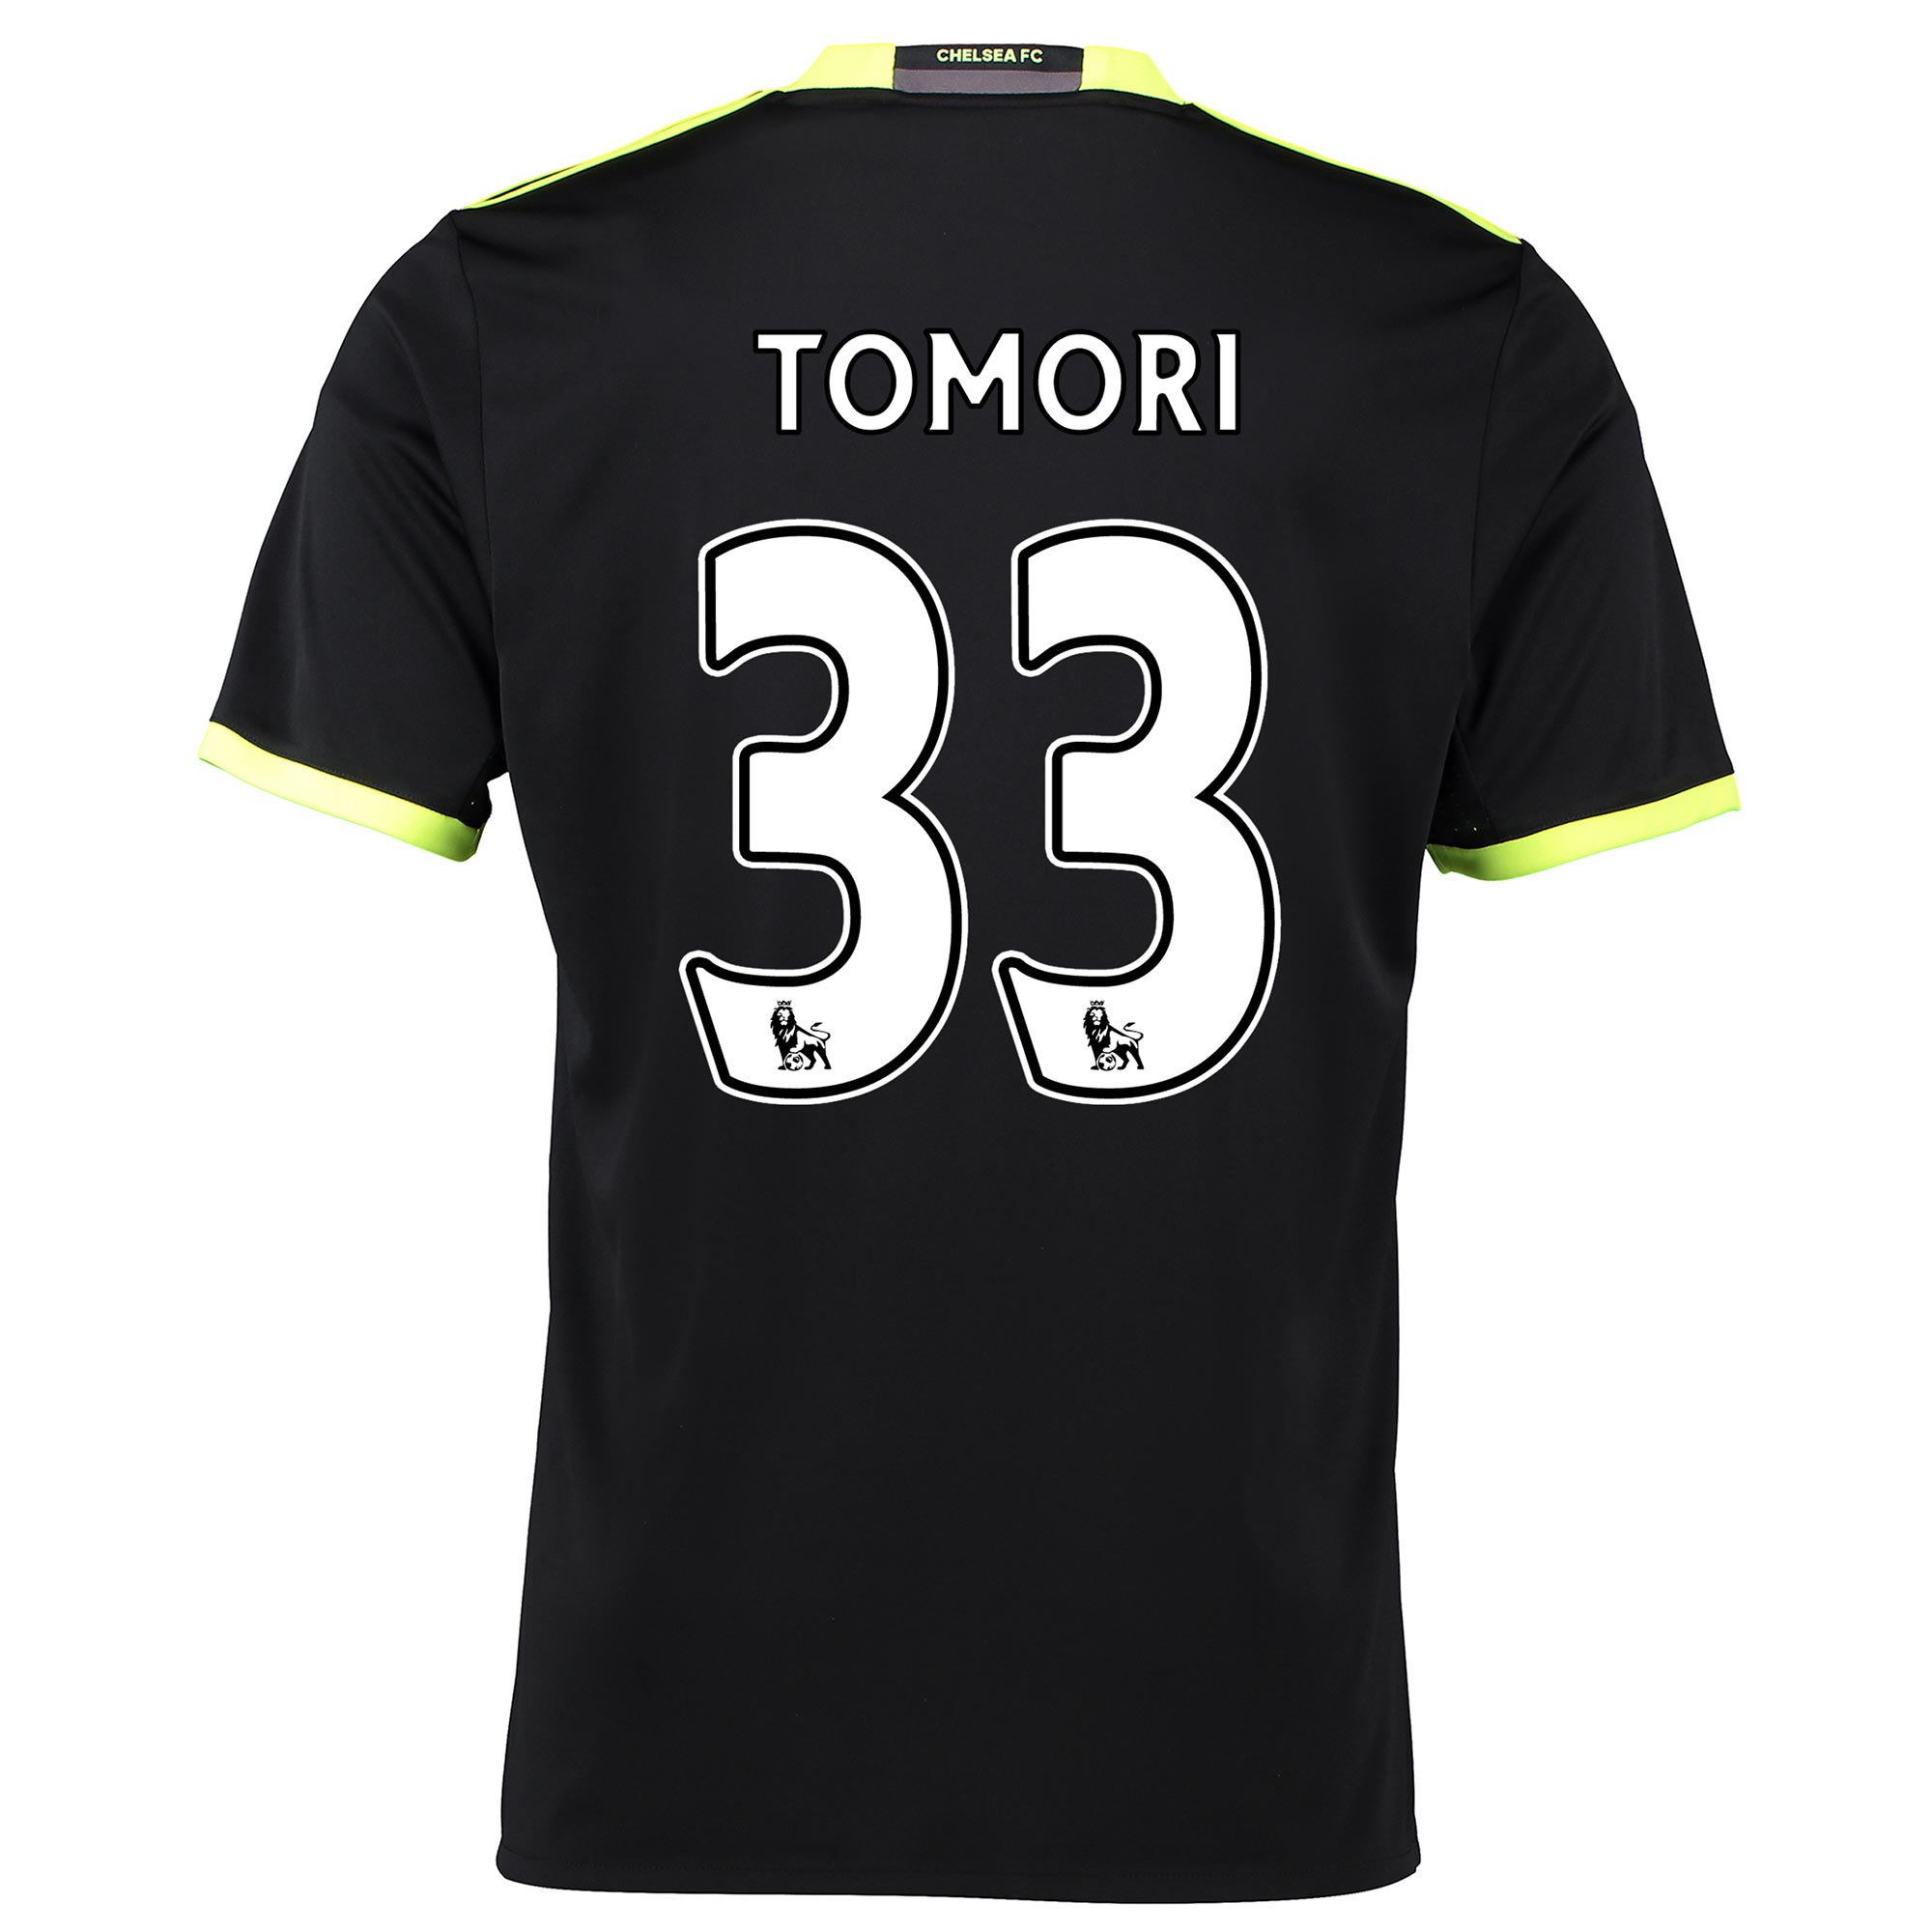 Chelsea Away Shirt 16-17 with Tomori 33 printing